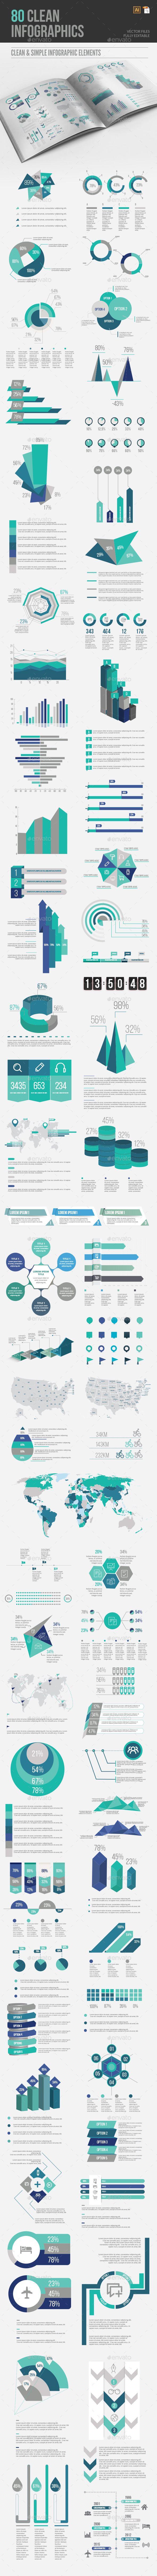 Infographic Element Templates Vector EPS, AI Illustrator. Download here: https://graphicriver.net/item/infographic-elements/17376832?ref=ksioks